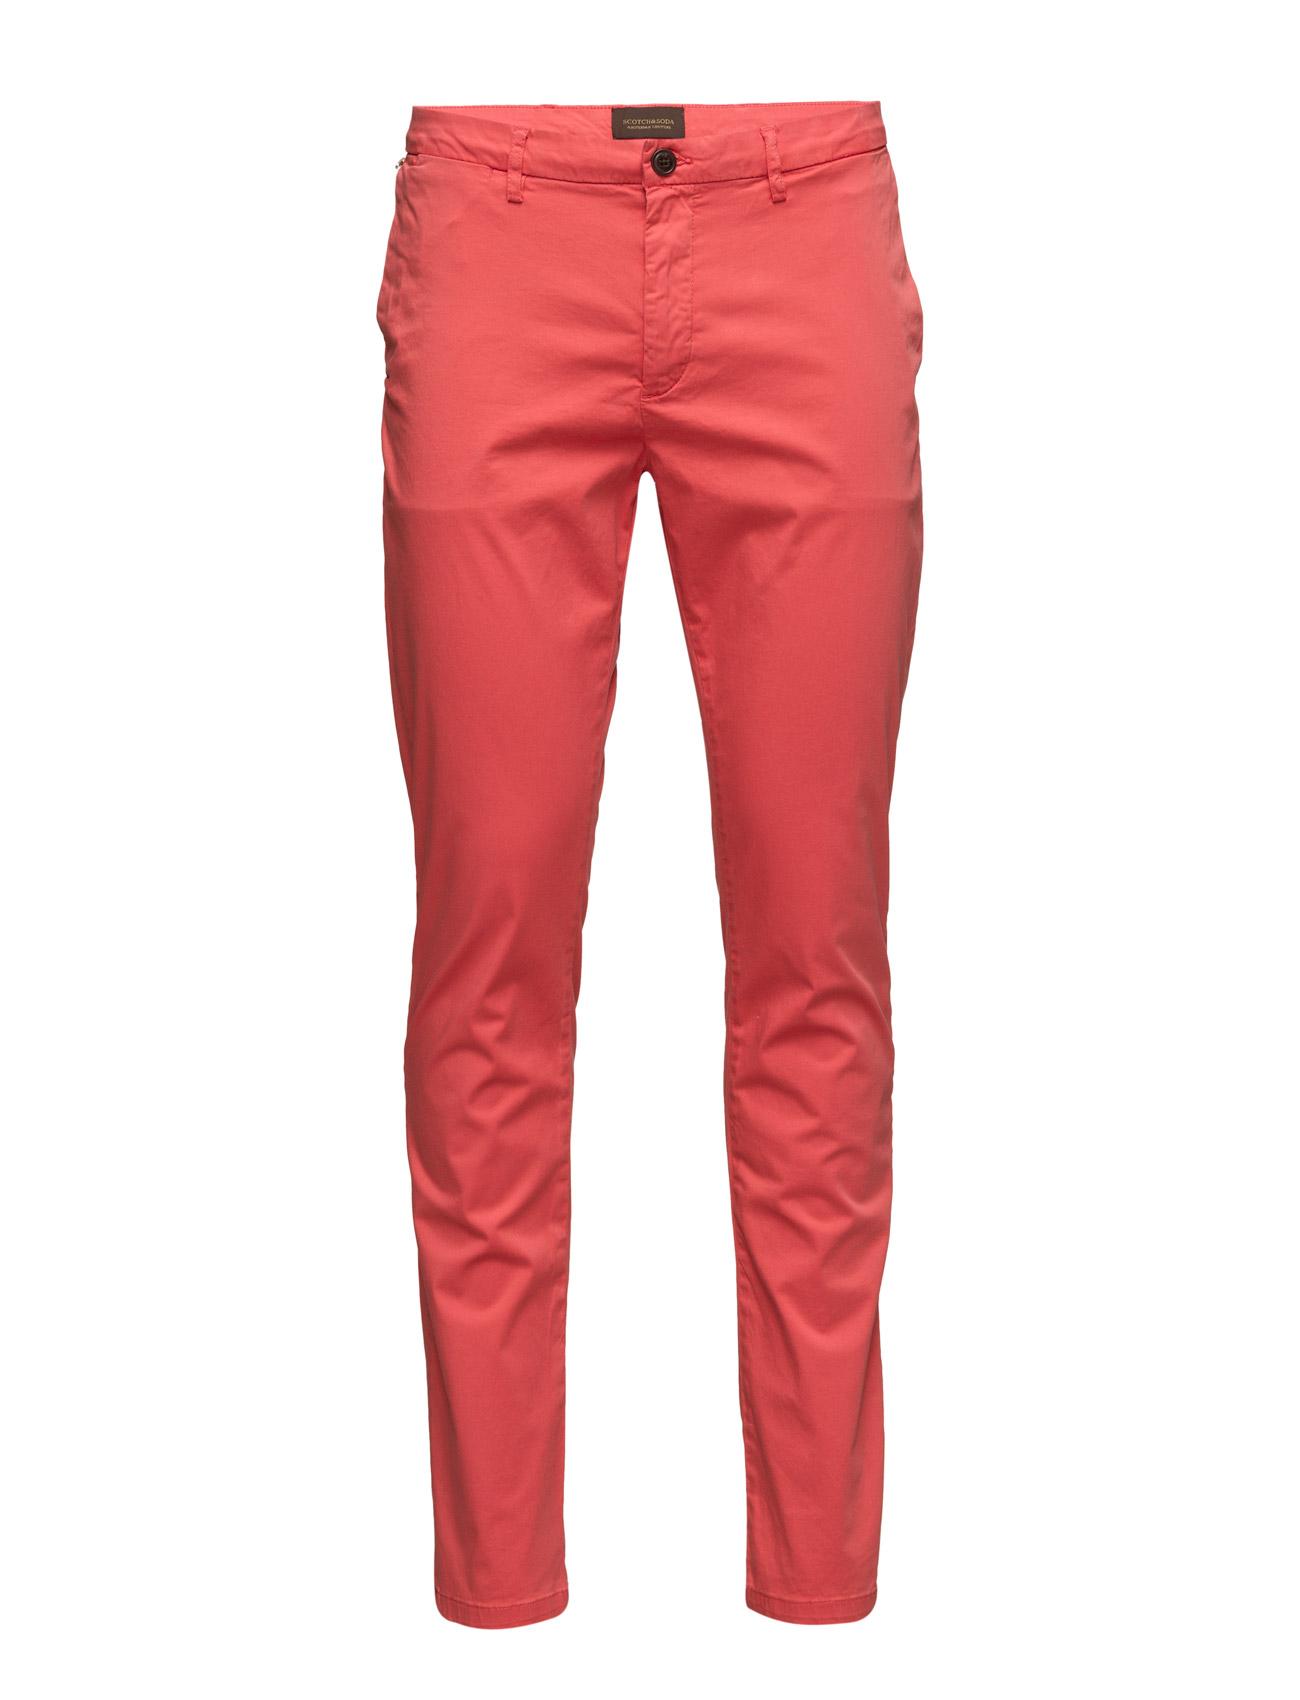 Garment Dyed Stretch Satine Chino Scotch & Soda Chinos til Mænd i